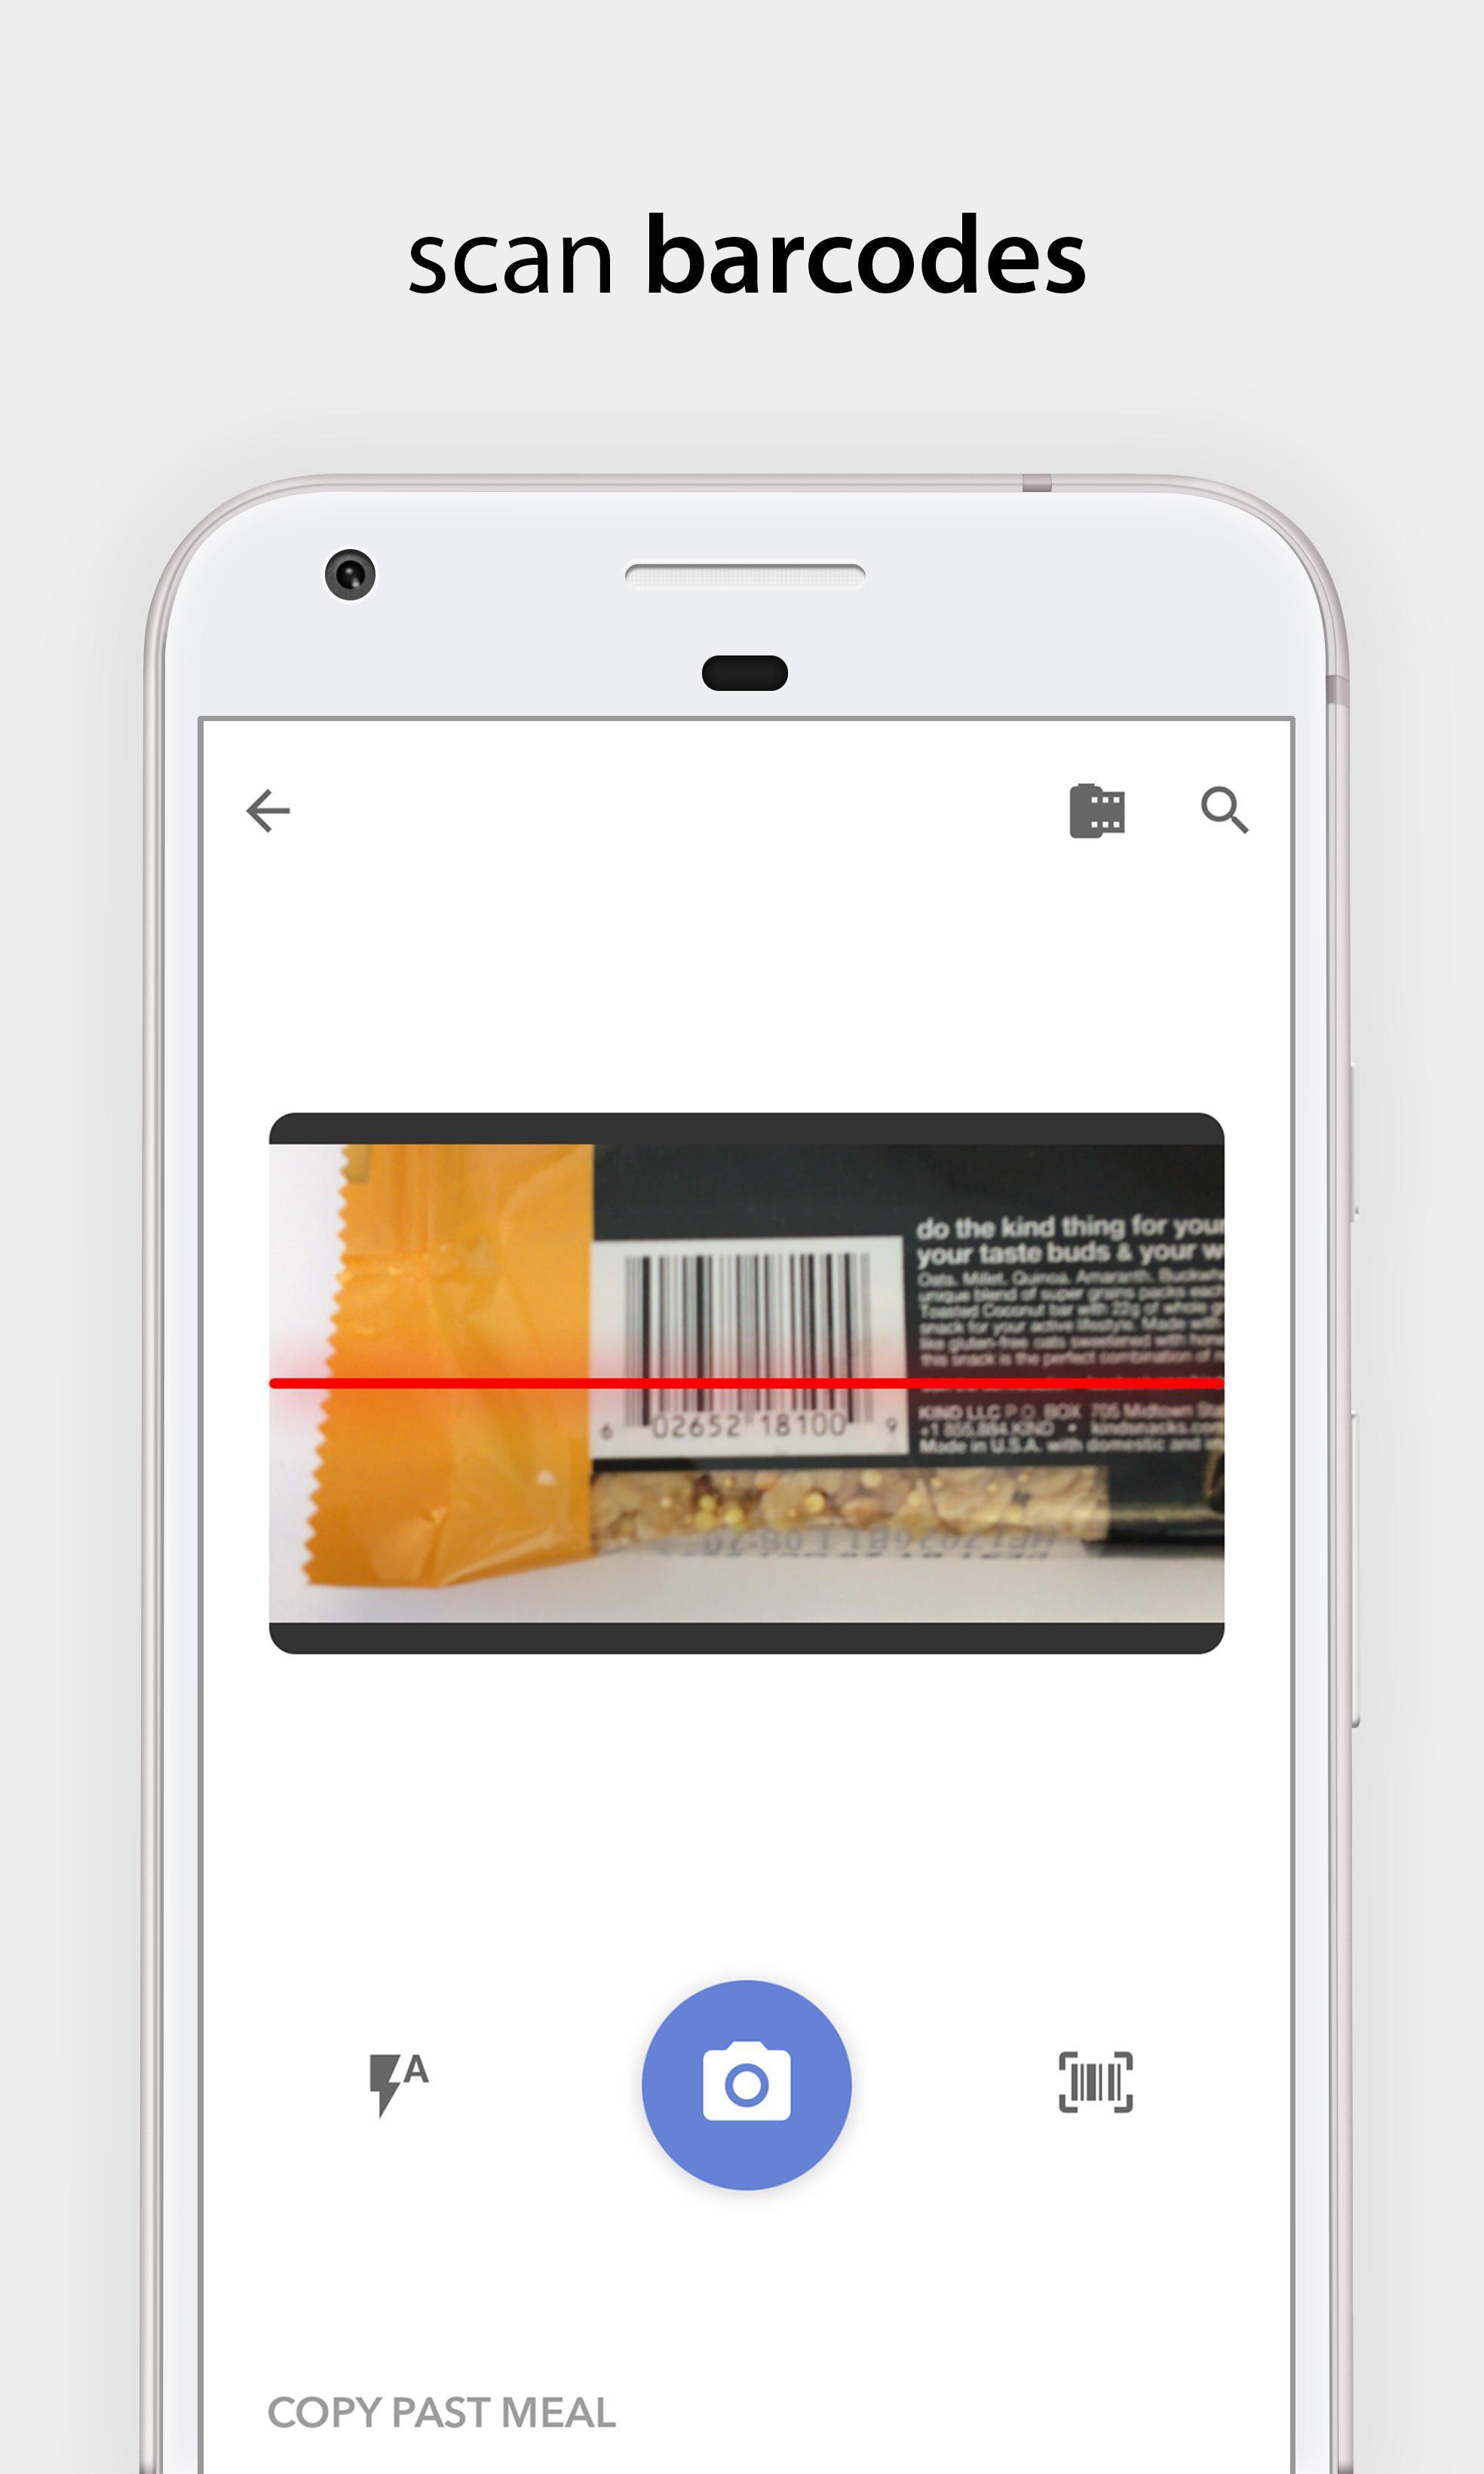 Bitesnap Photo Food Tracker and Calorie Counter 1.6.3 Screenshot 6